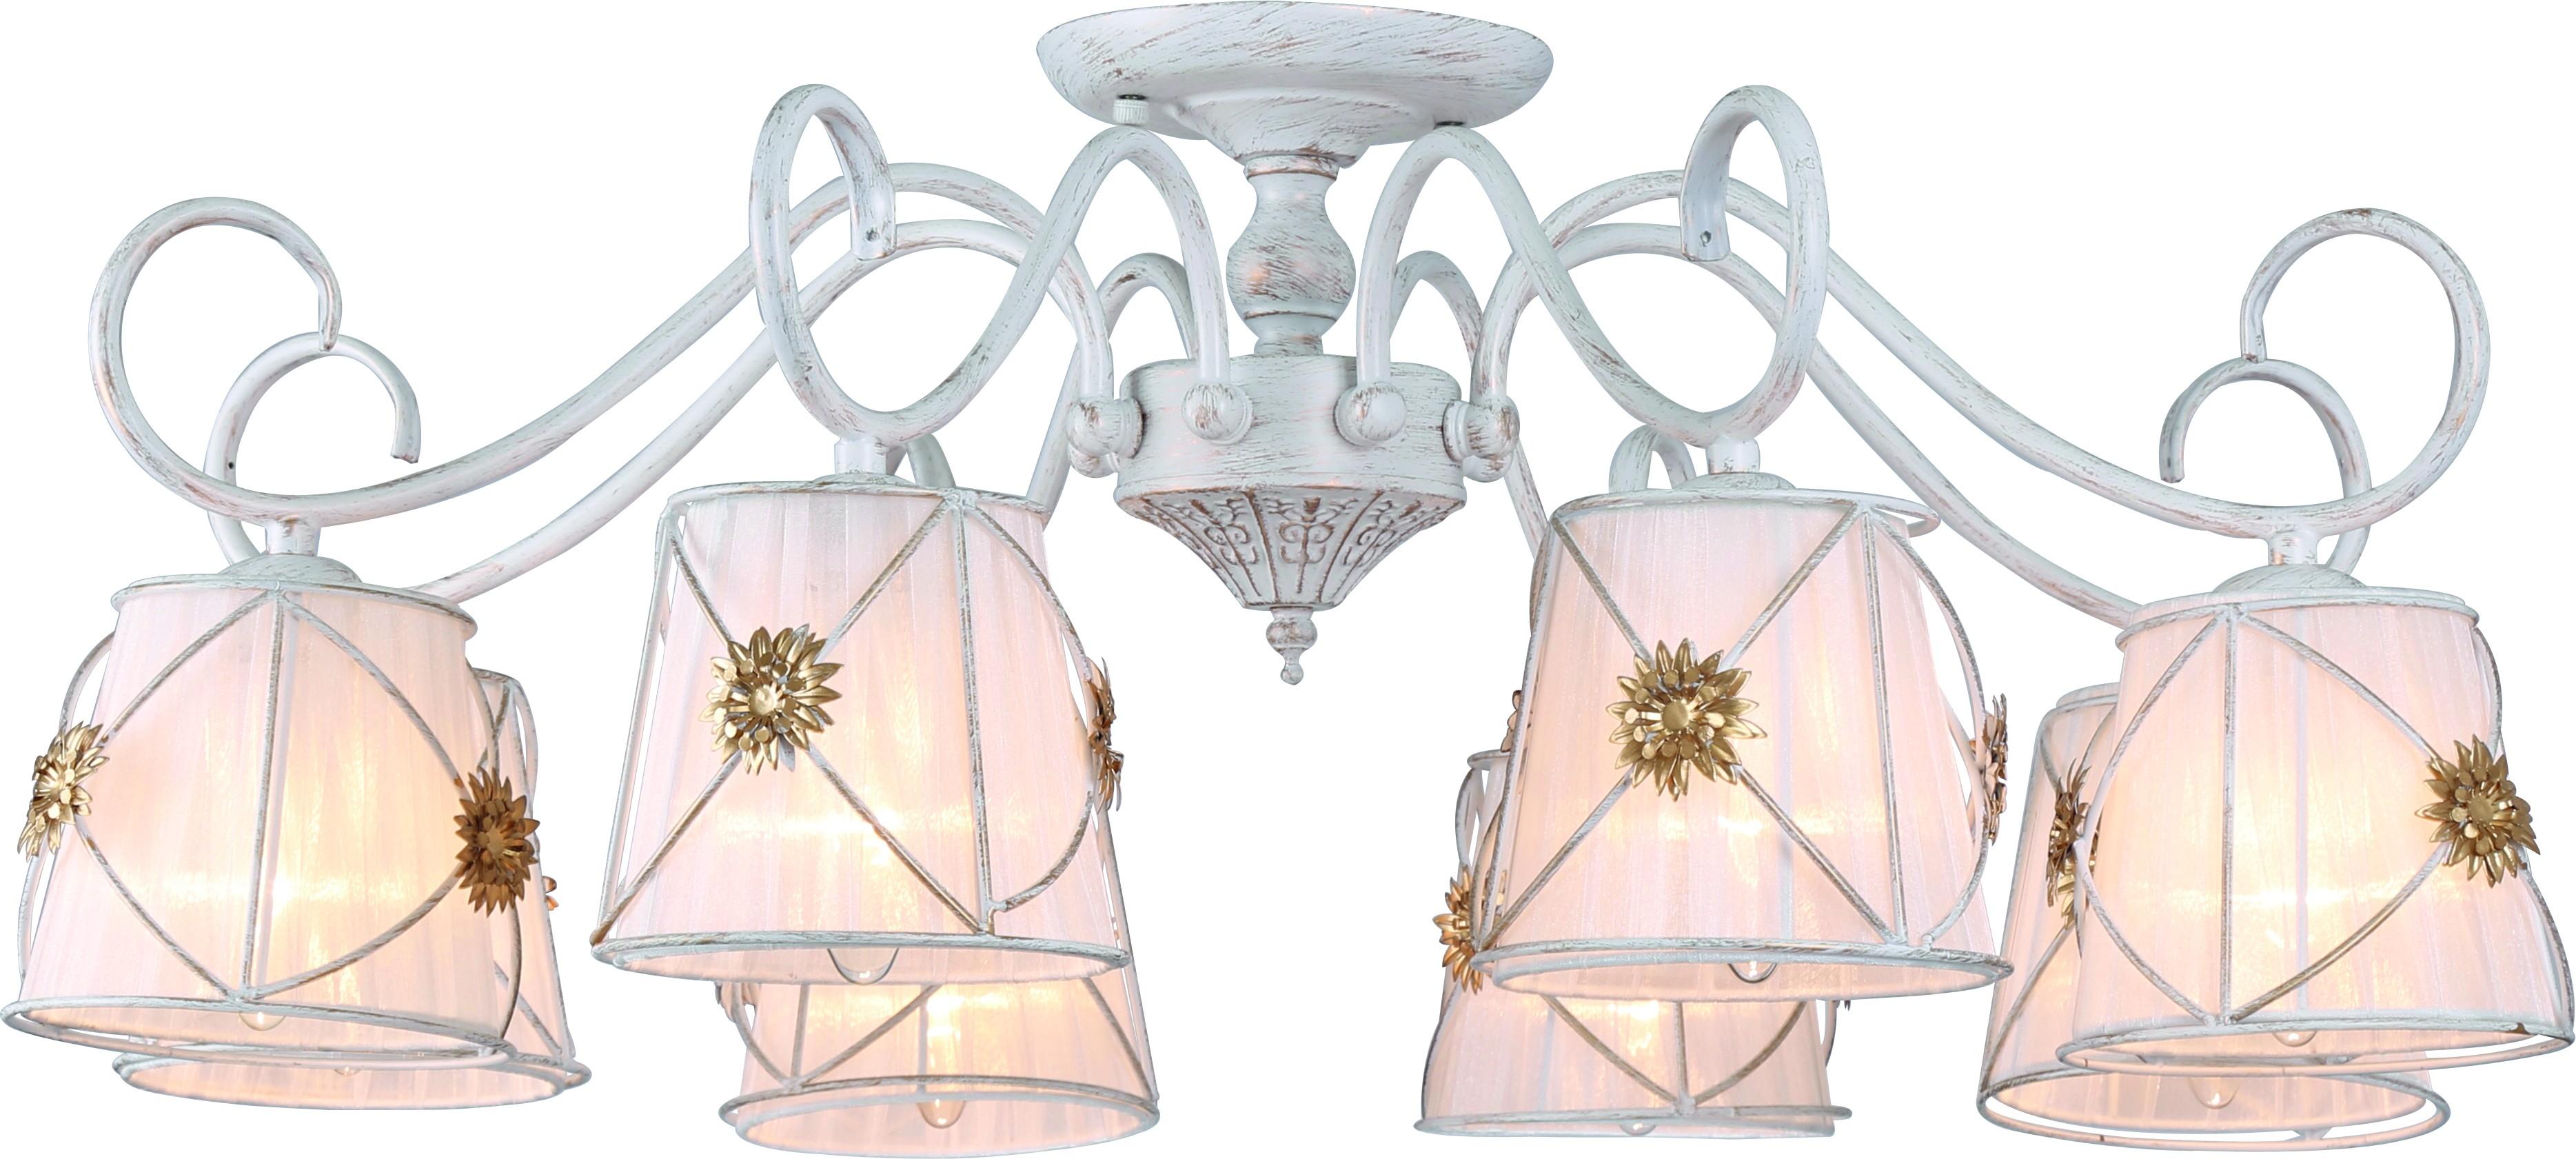 Люстра Arte lamp A5495pl-8wg люстра на штанге arte lamp fortuna a5495pl 8wg